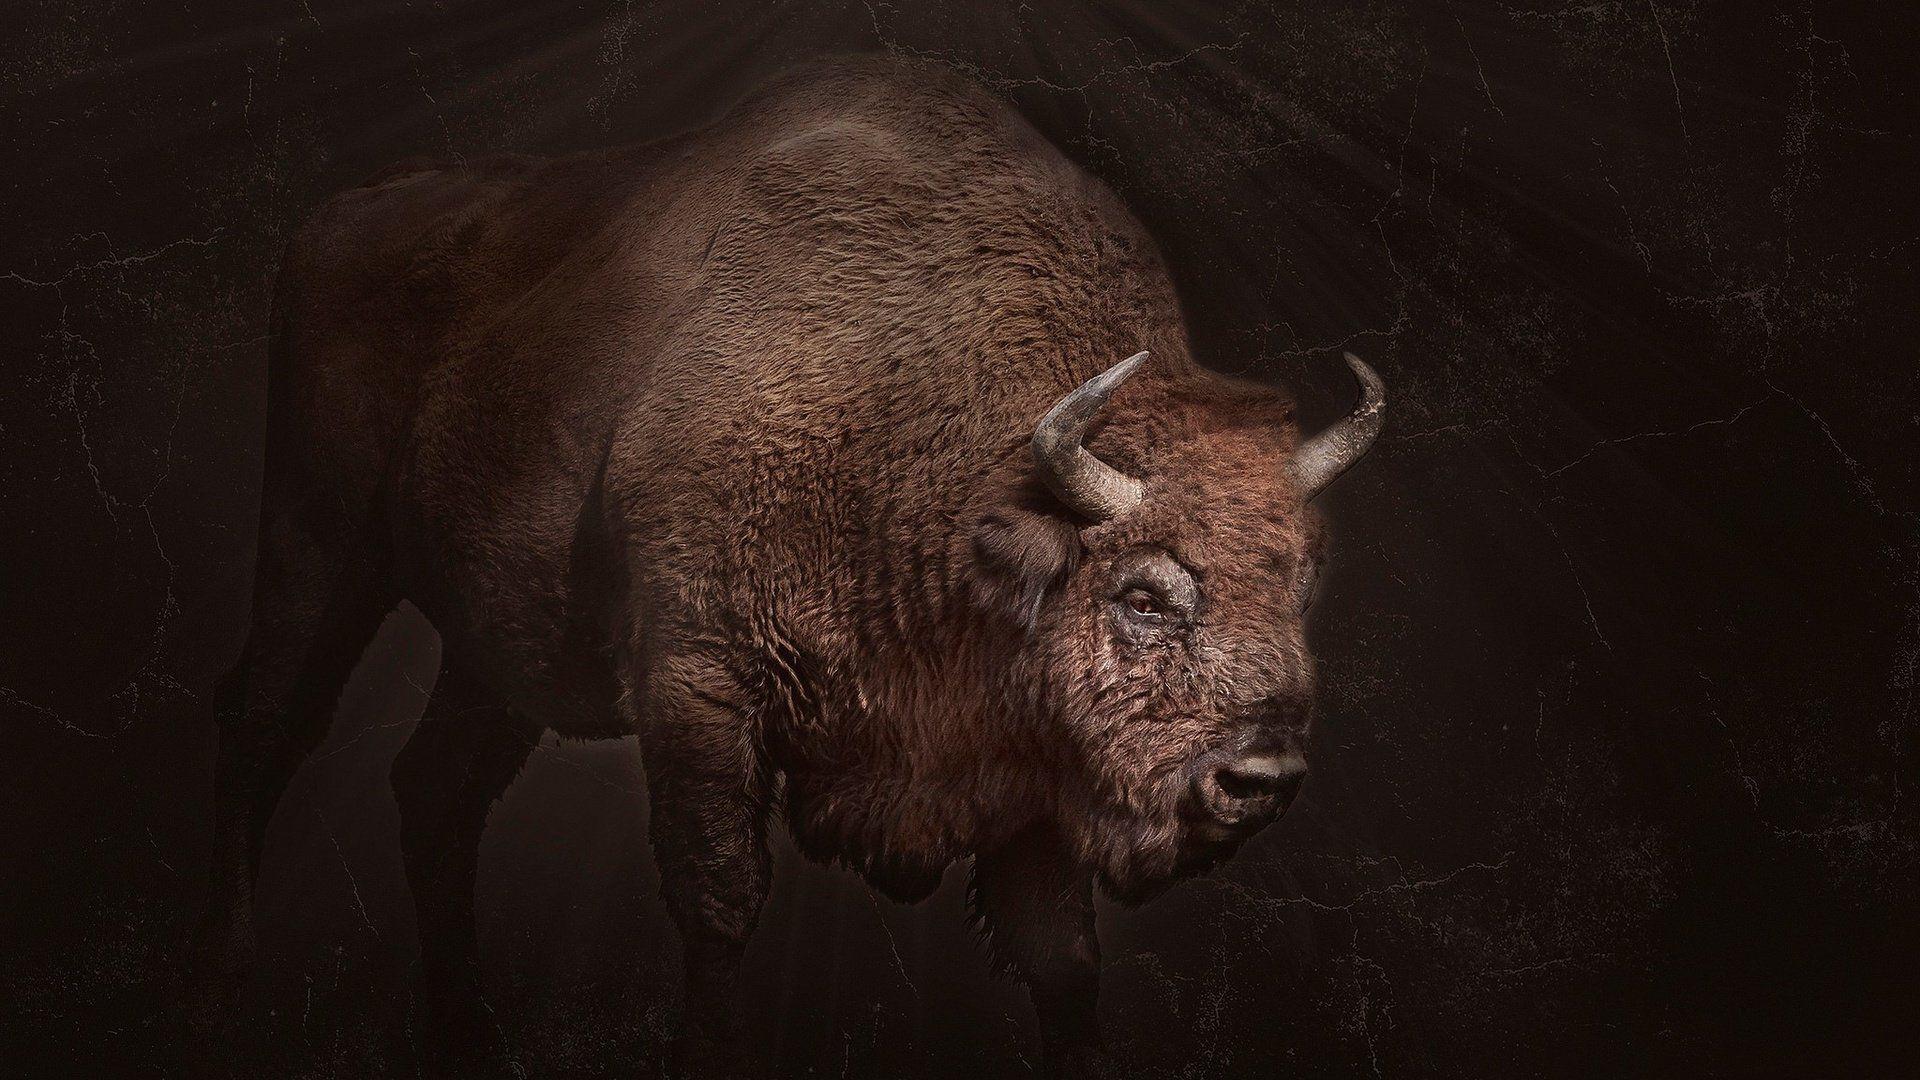 Bison Hd Photo